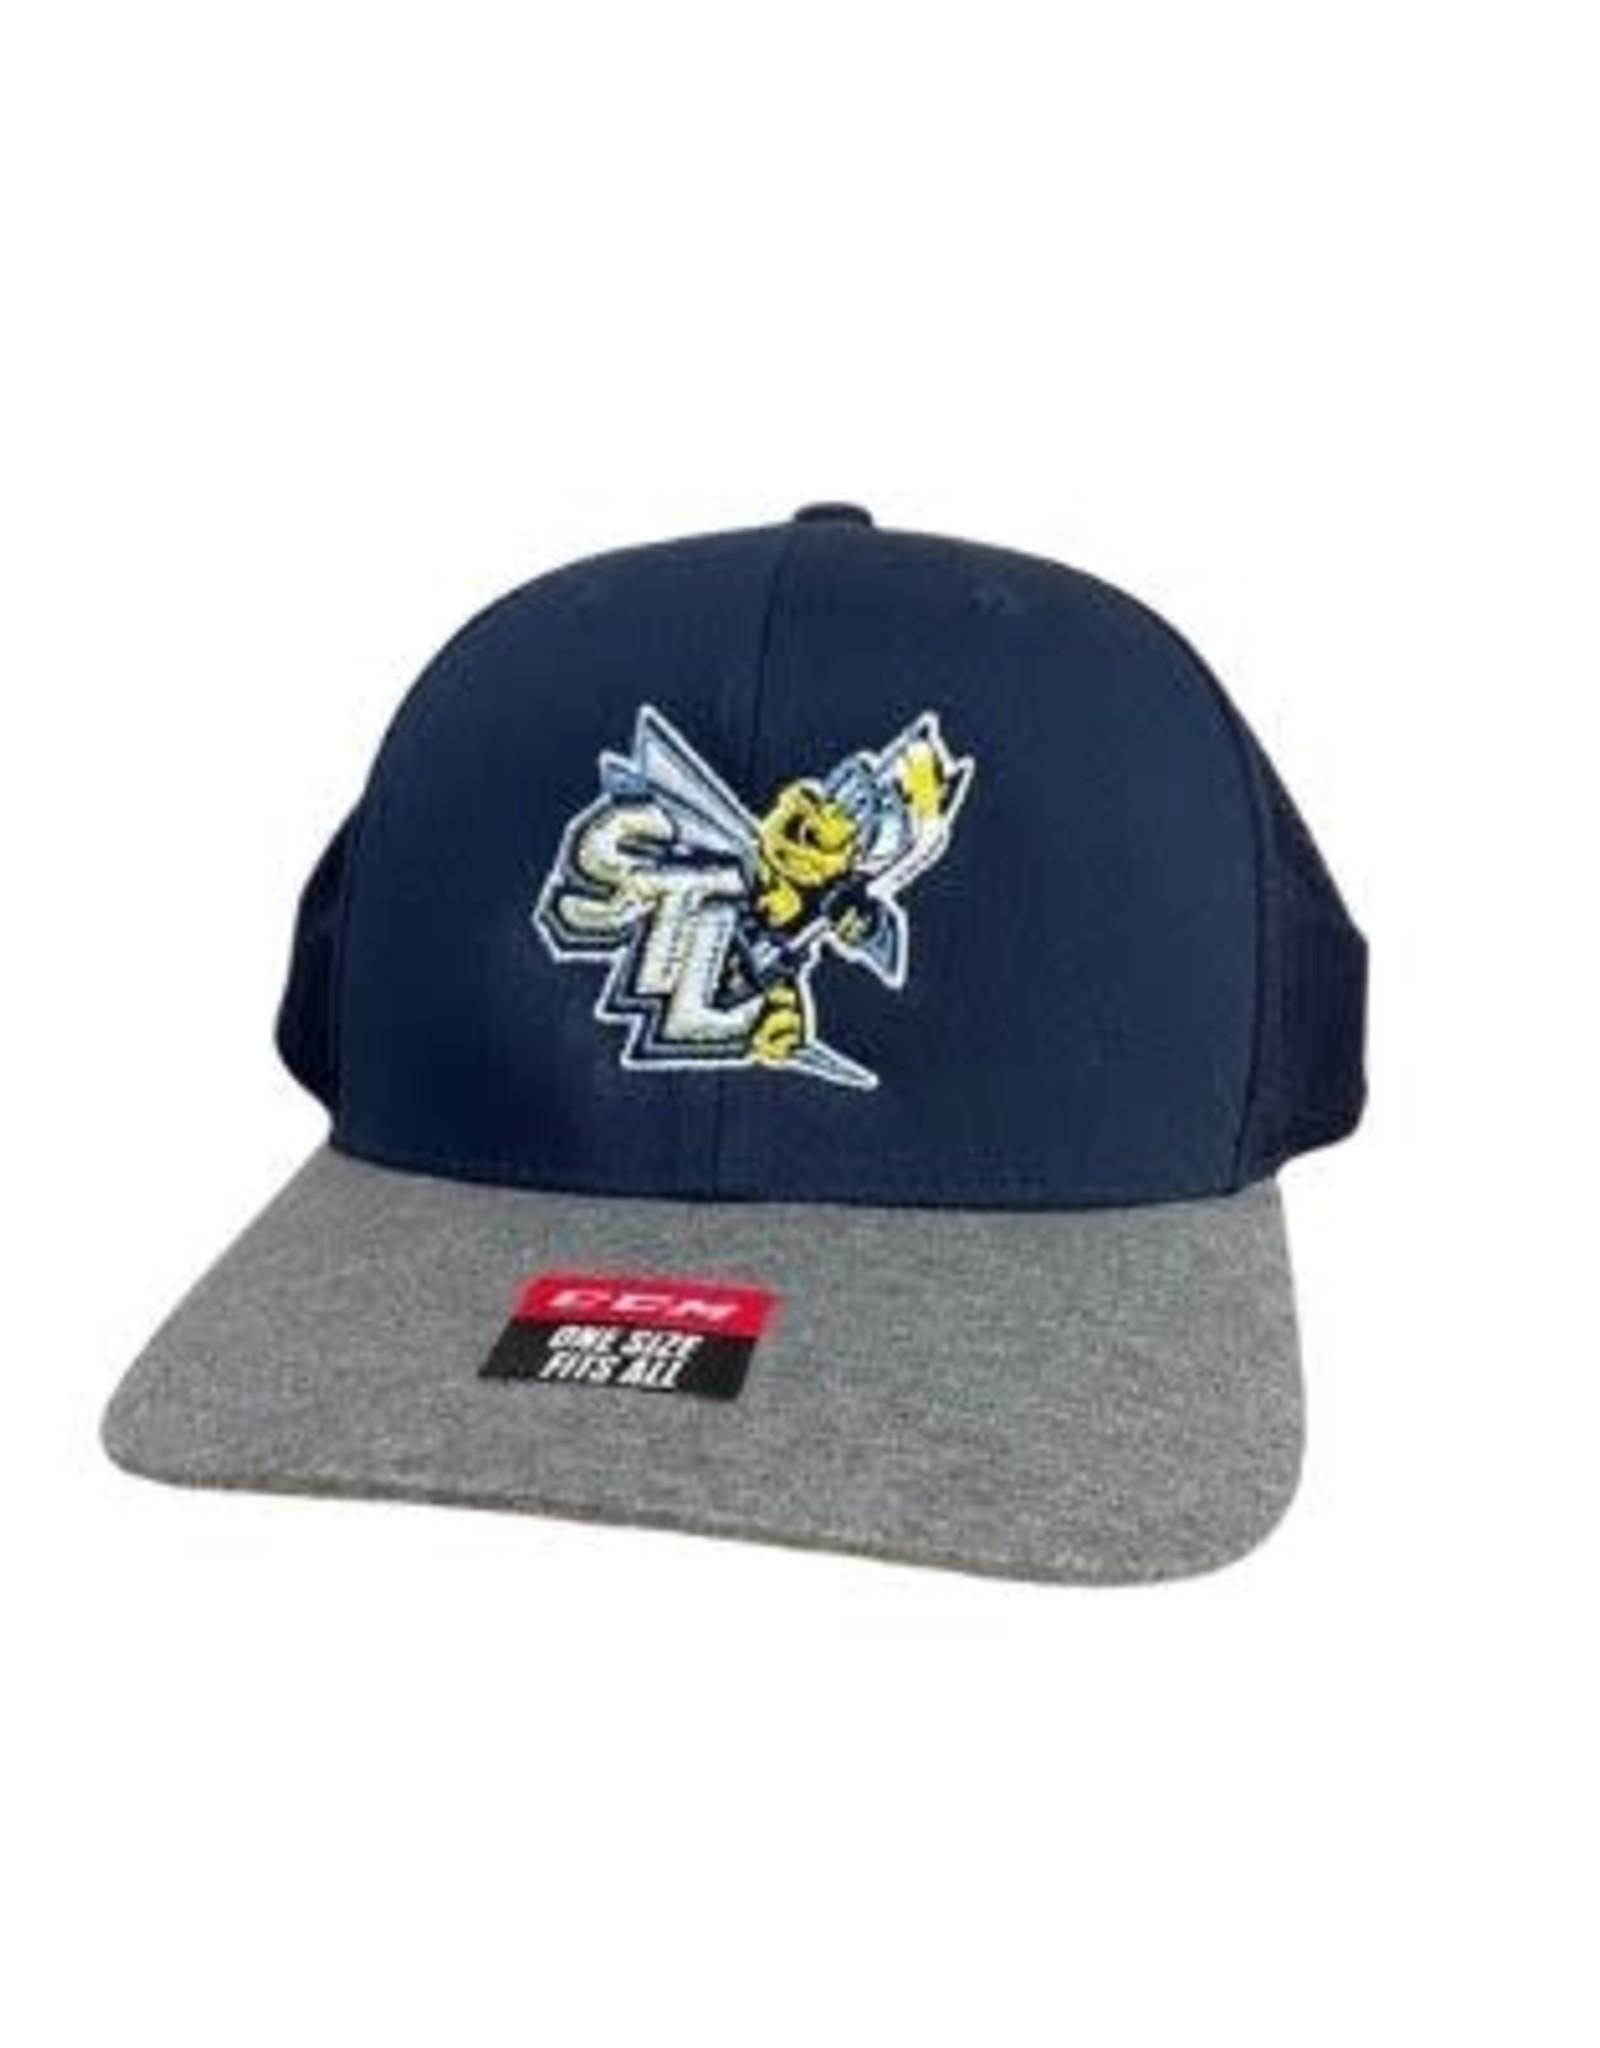 CCM STING CCM Navy/Grey Mesh Hat